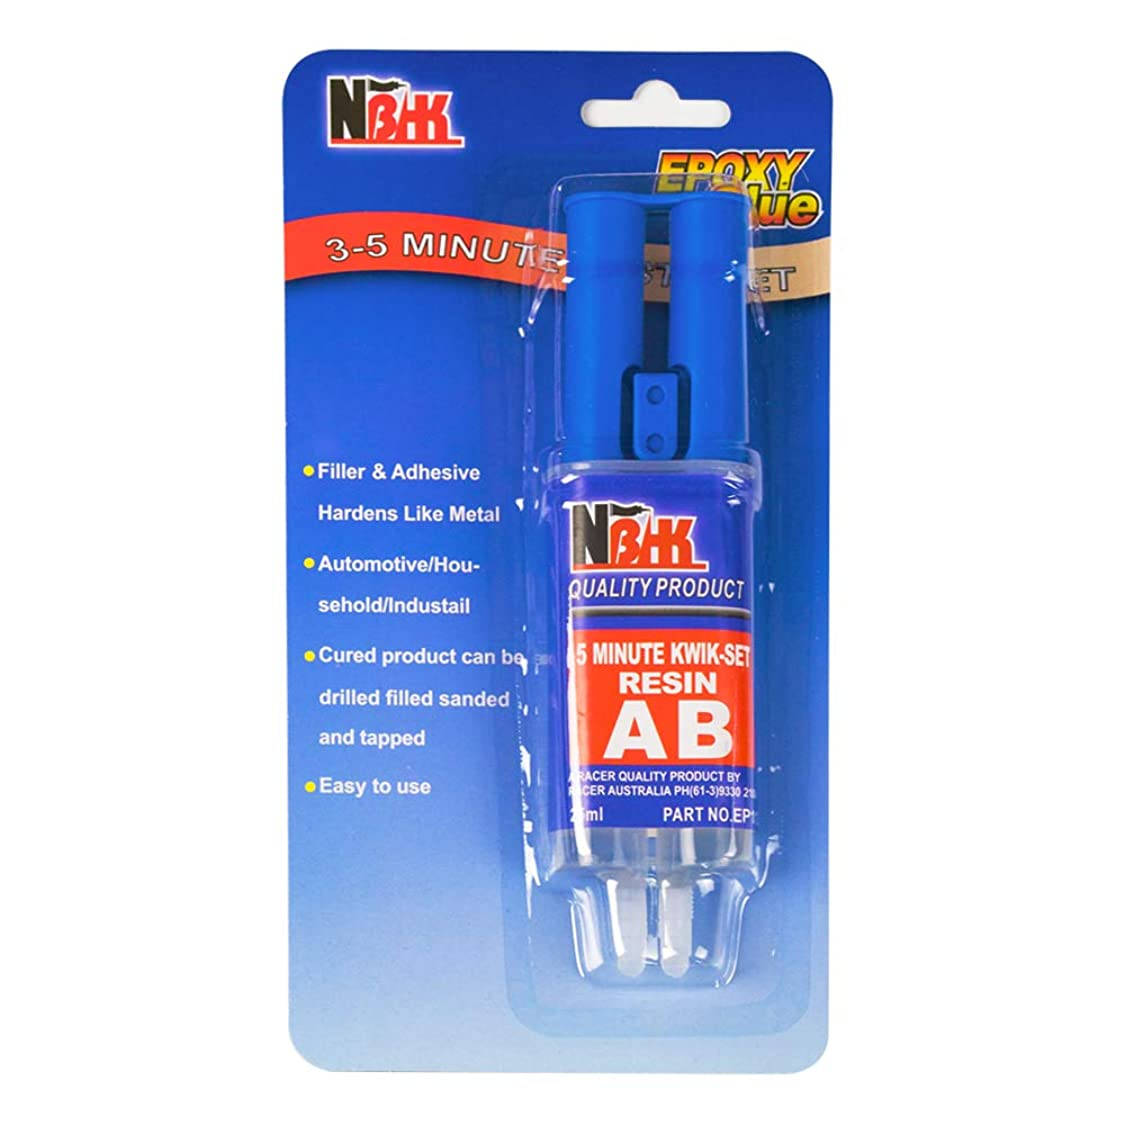 Epoxy Glue, 25ml MinuteWeld Instant-Setting Epoxy Syringe, Yanyi 0.85-Fluid Ounce Epoxy Resin Crystal Clear for Crack Damage Fixing Filling or Sealing